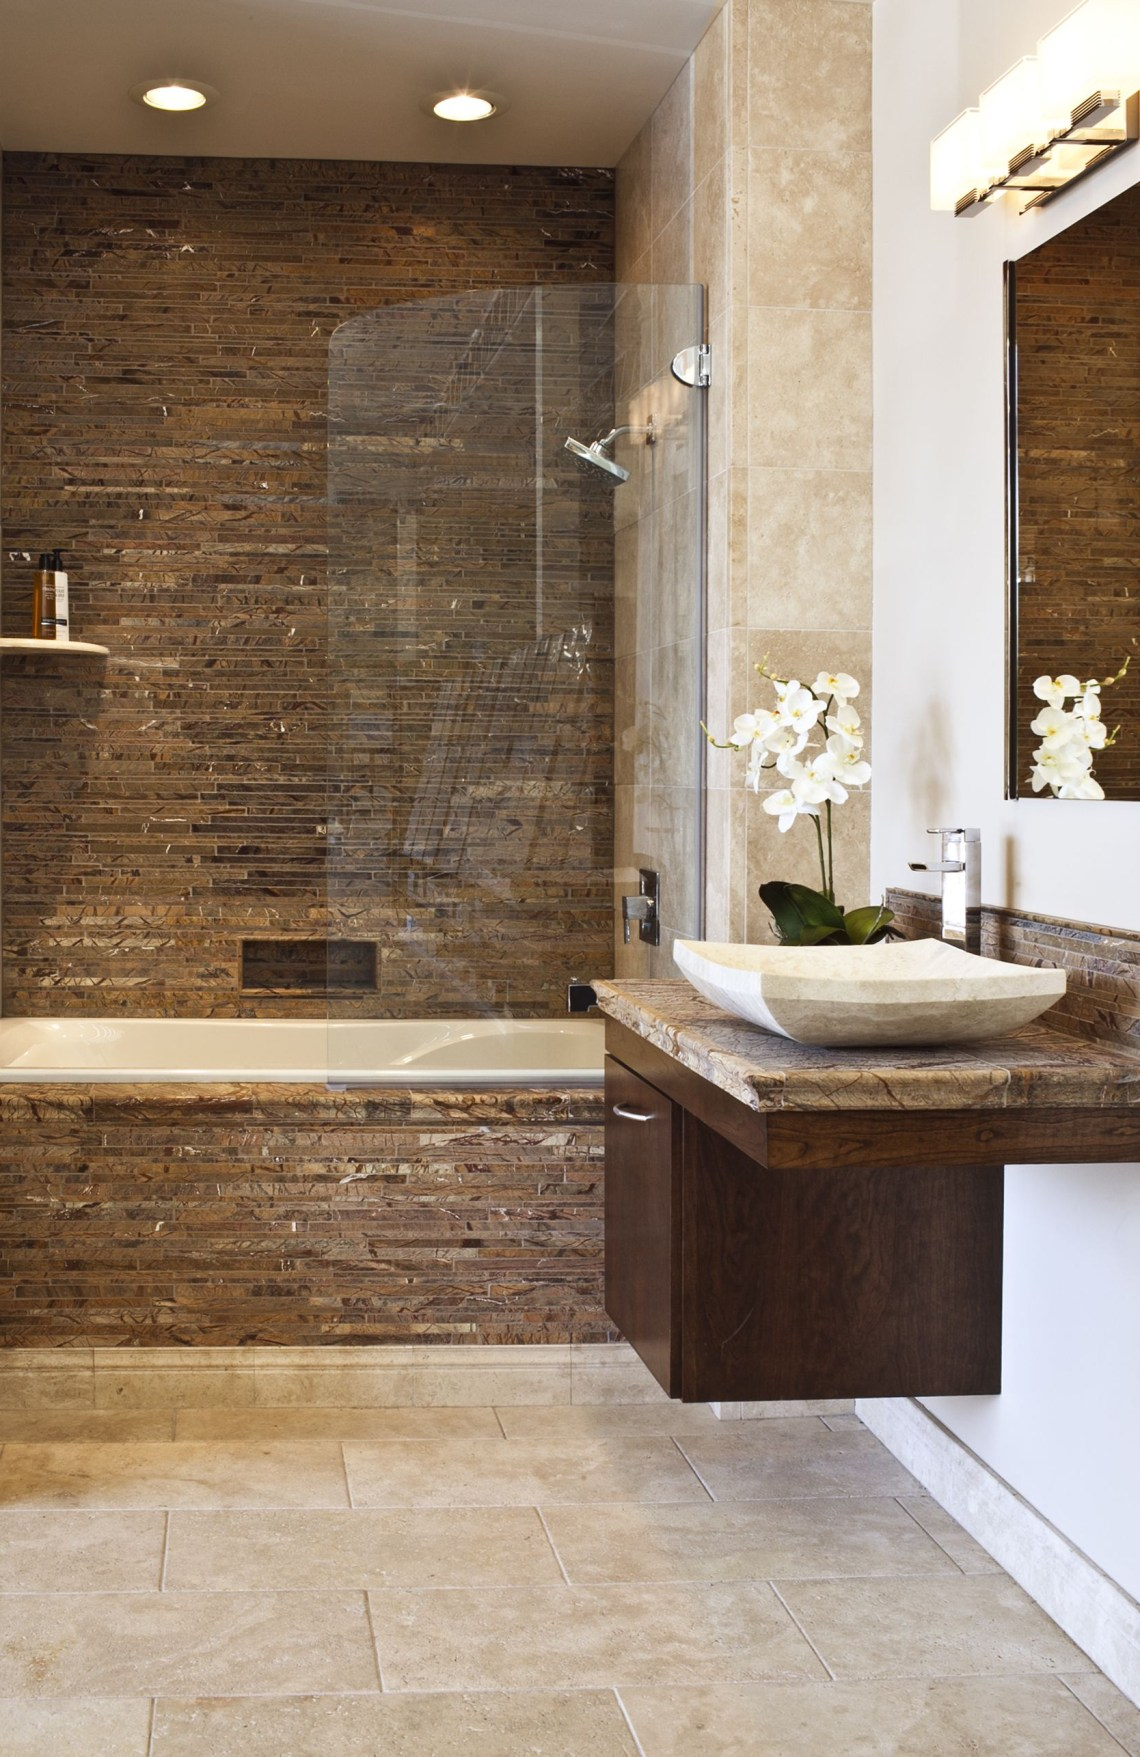 Forest Brown Marble Bathroom Brown Bathroom Basement Bathroom Mold In Bathroom